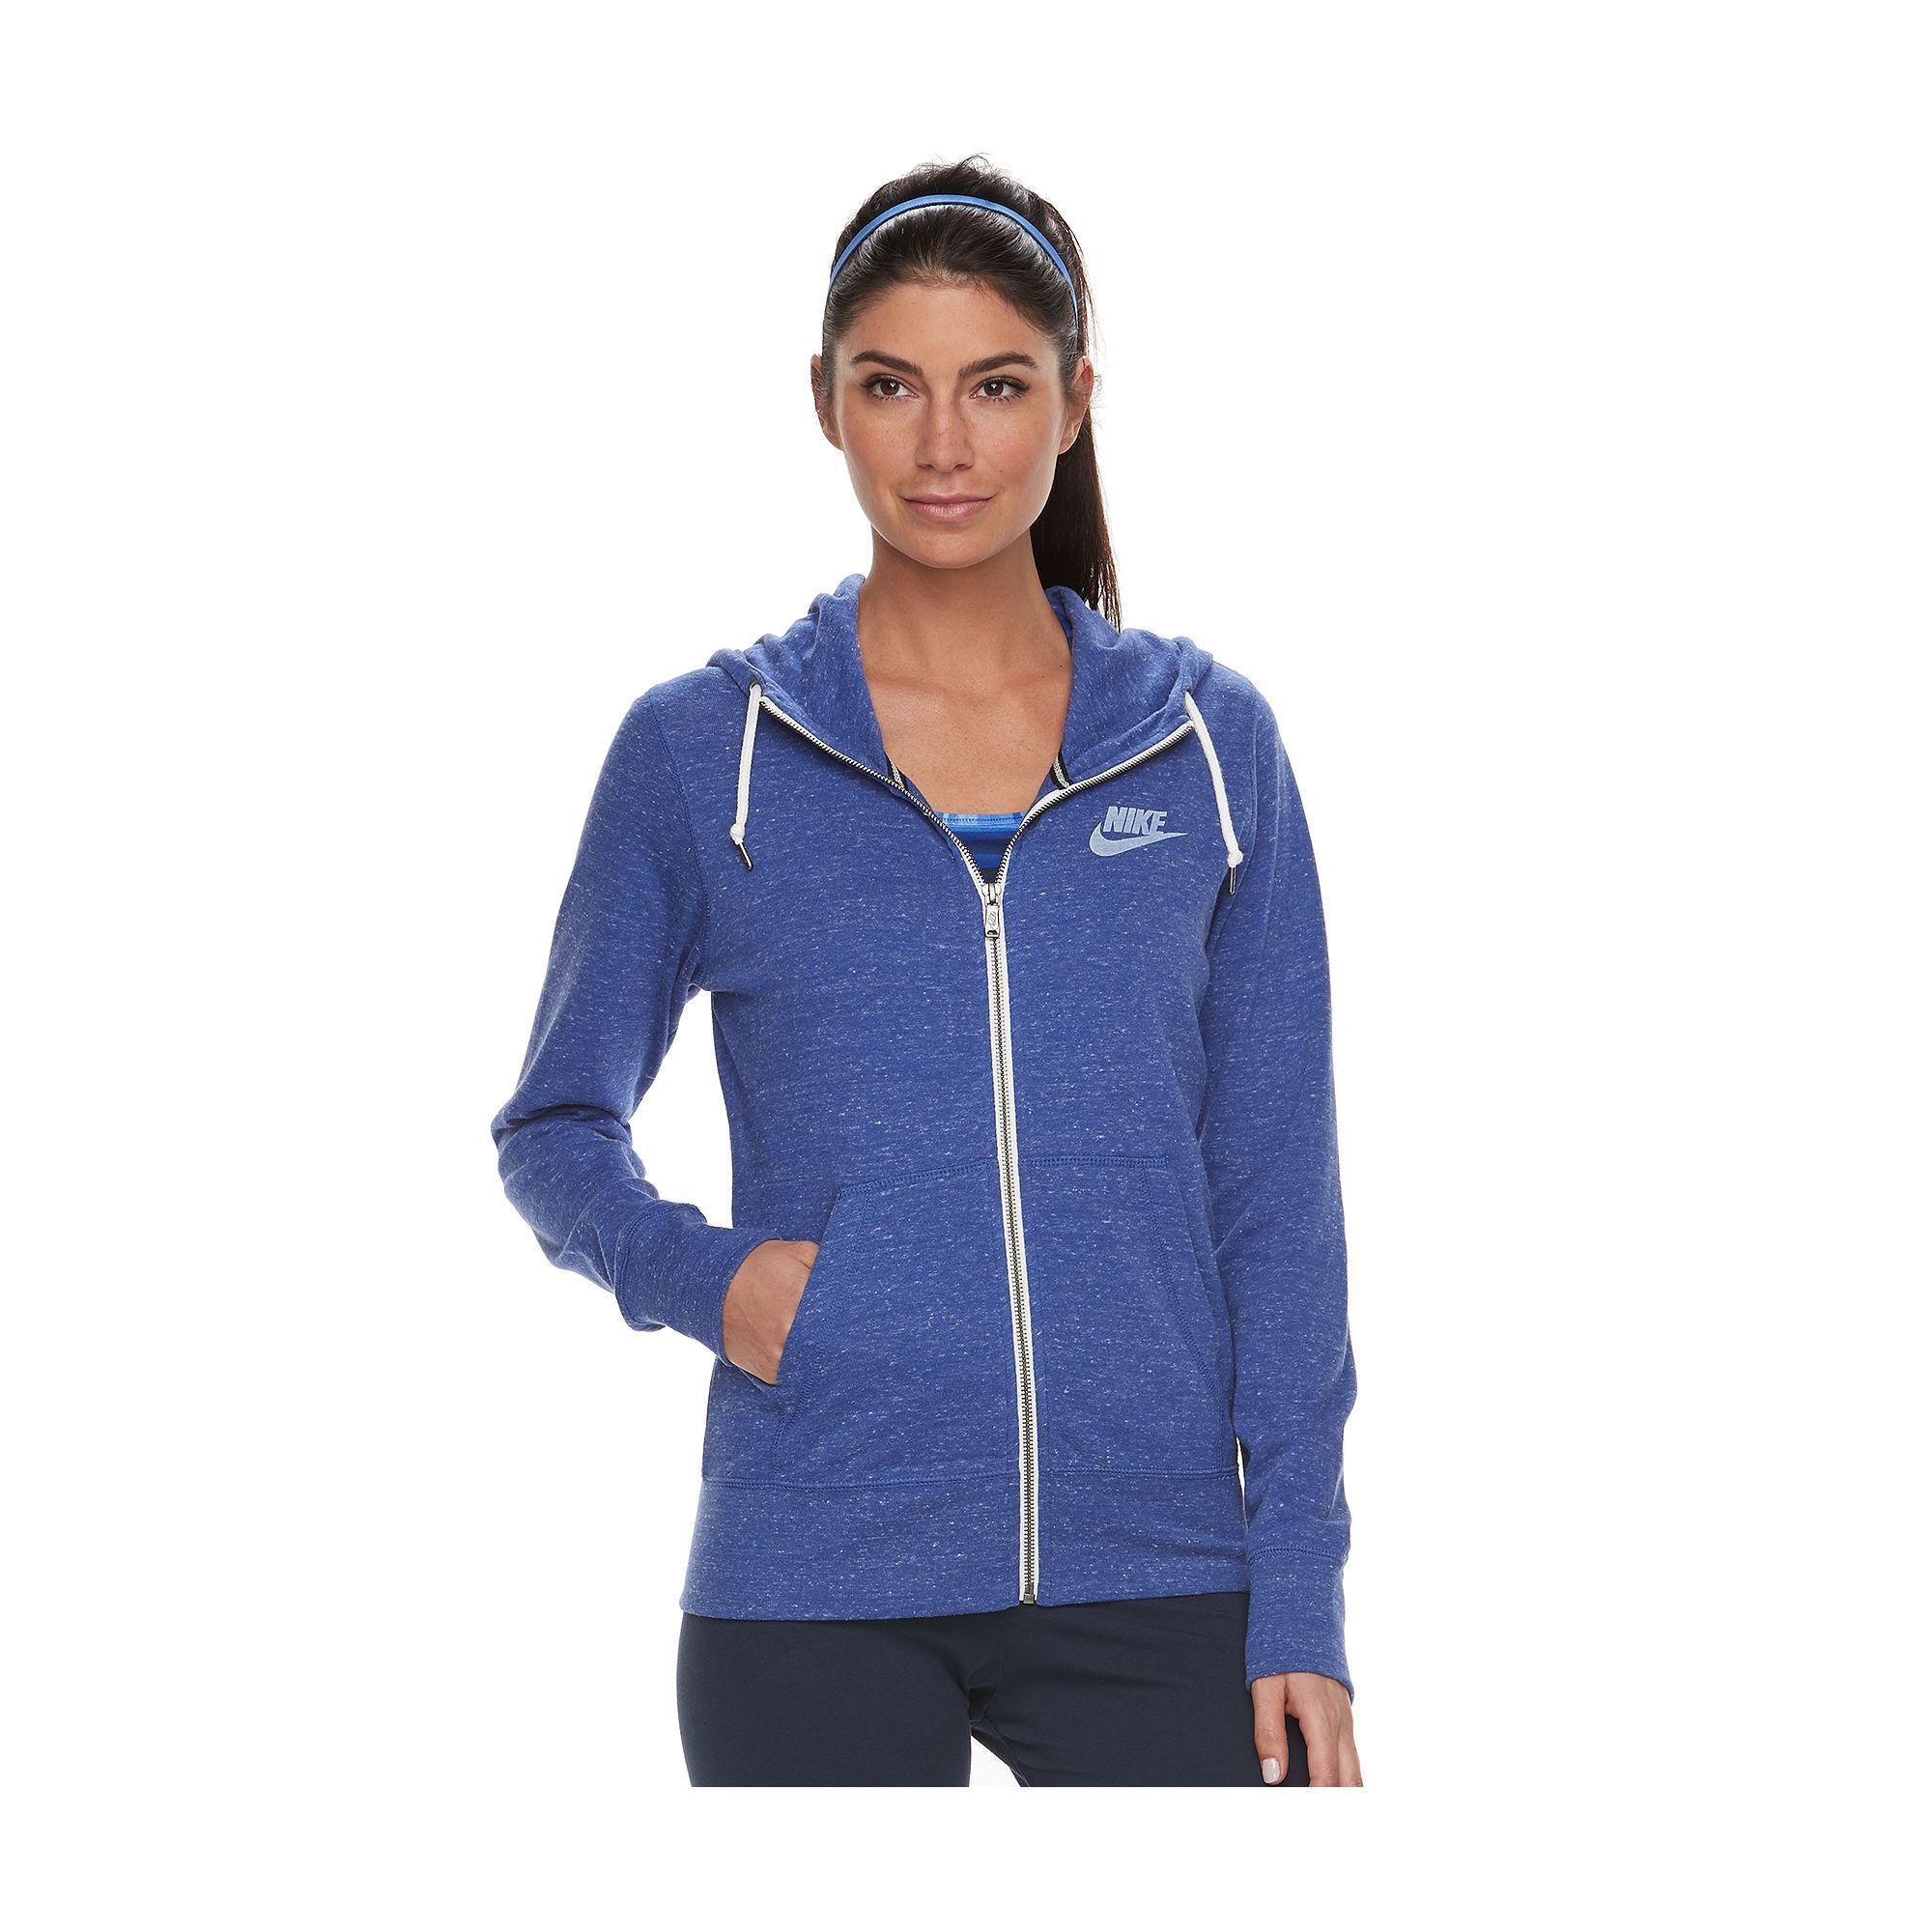 a9a6d12a83ef Women s Nike Gym Vintage Zip Up Hoodie in 2019